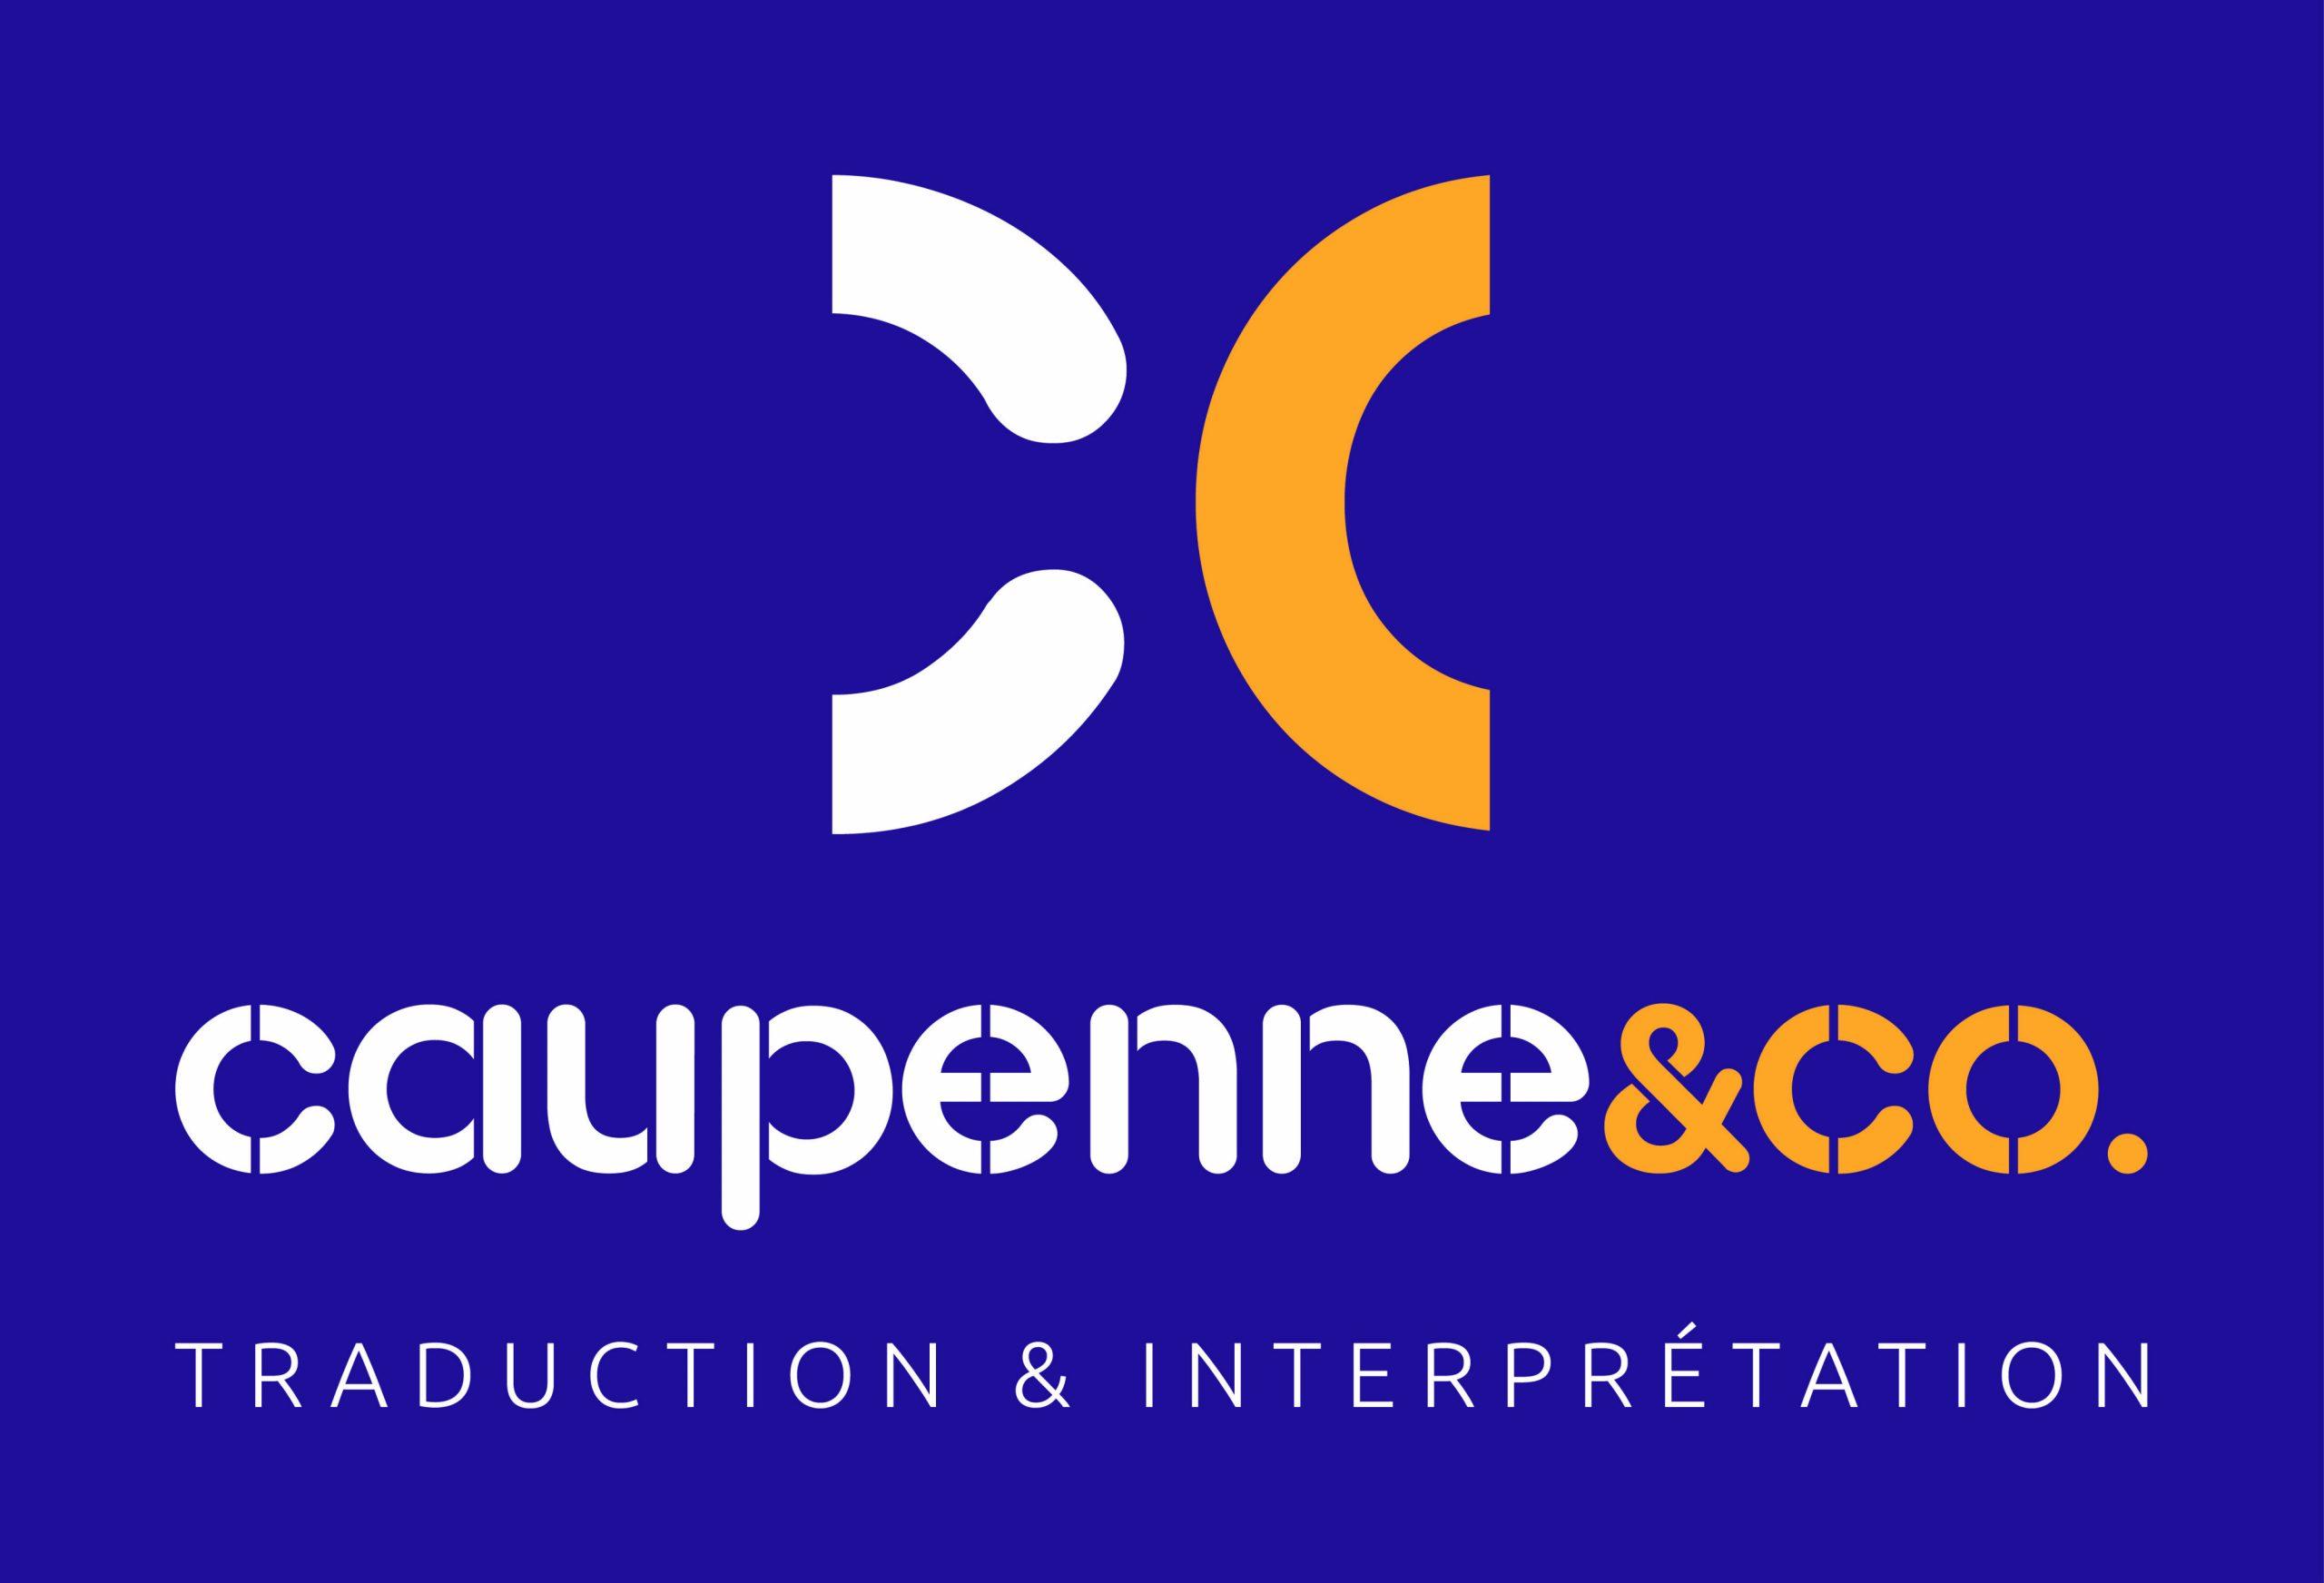 Caupenne & Co. Logo